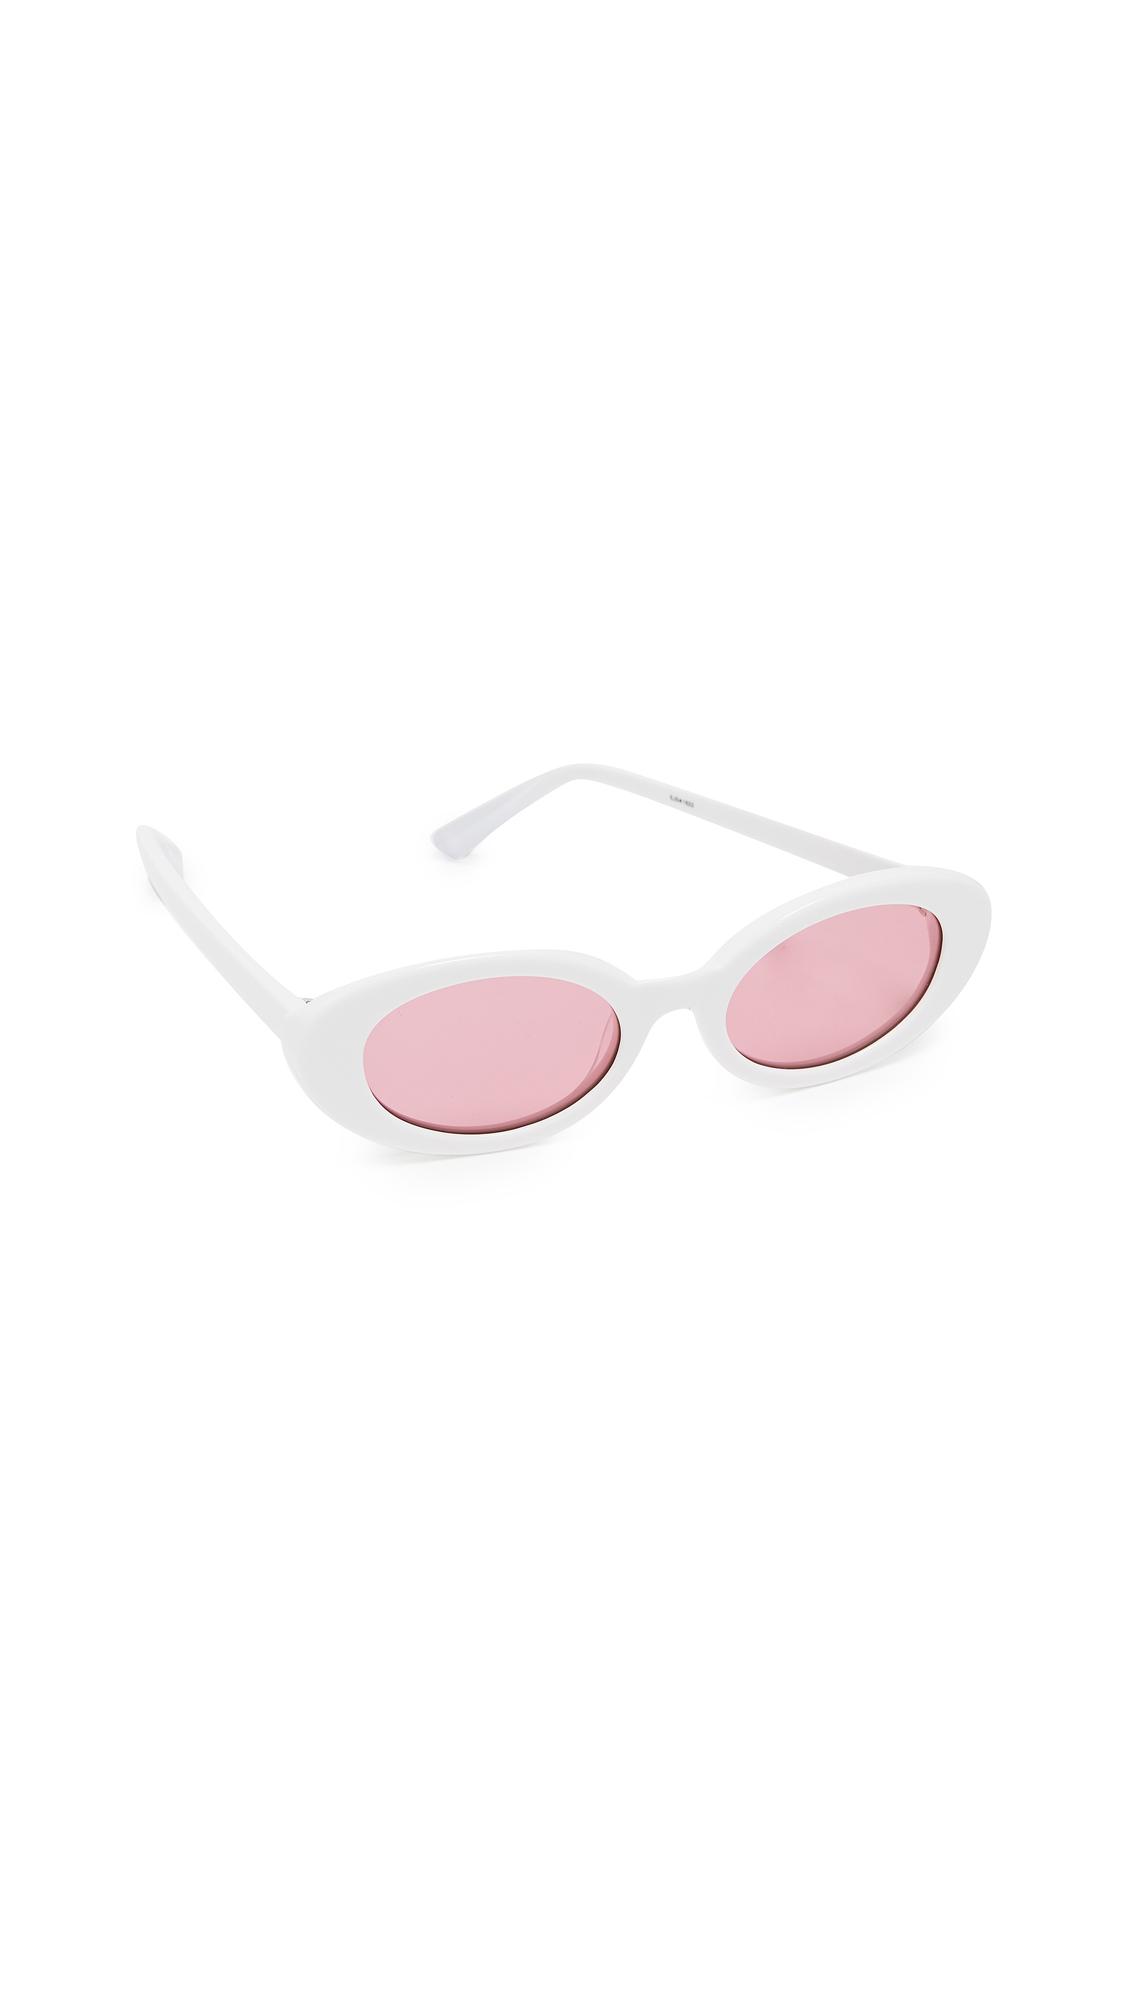 Mckinley Sunglasses, White/Rose